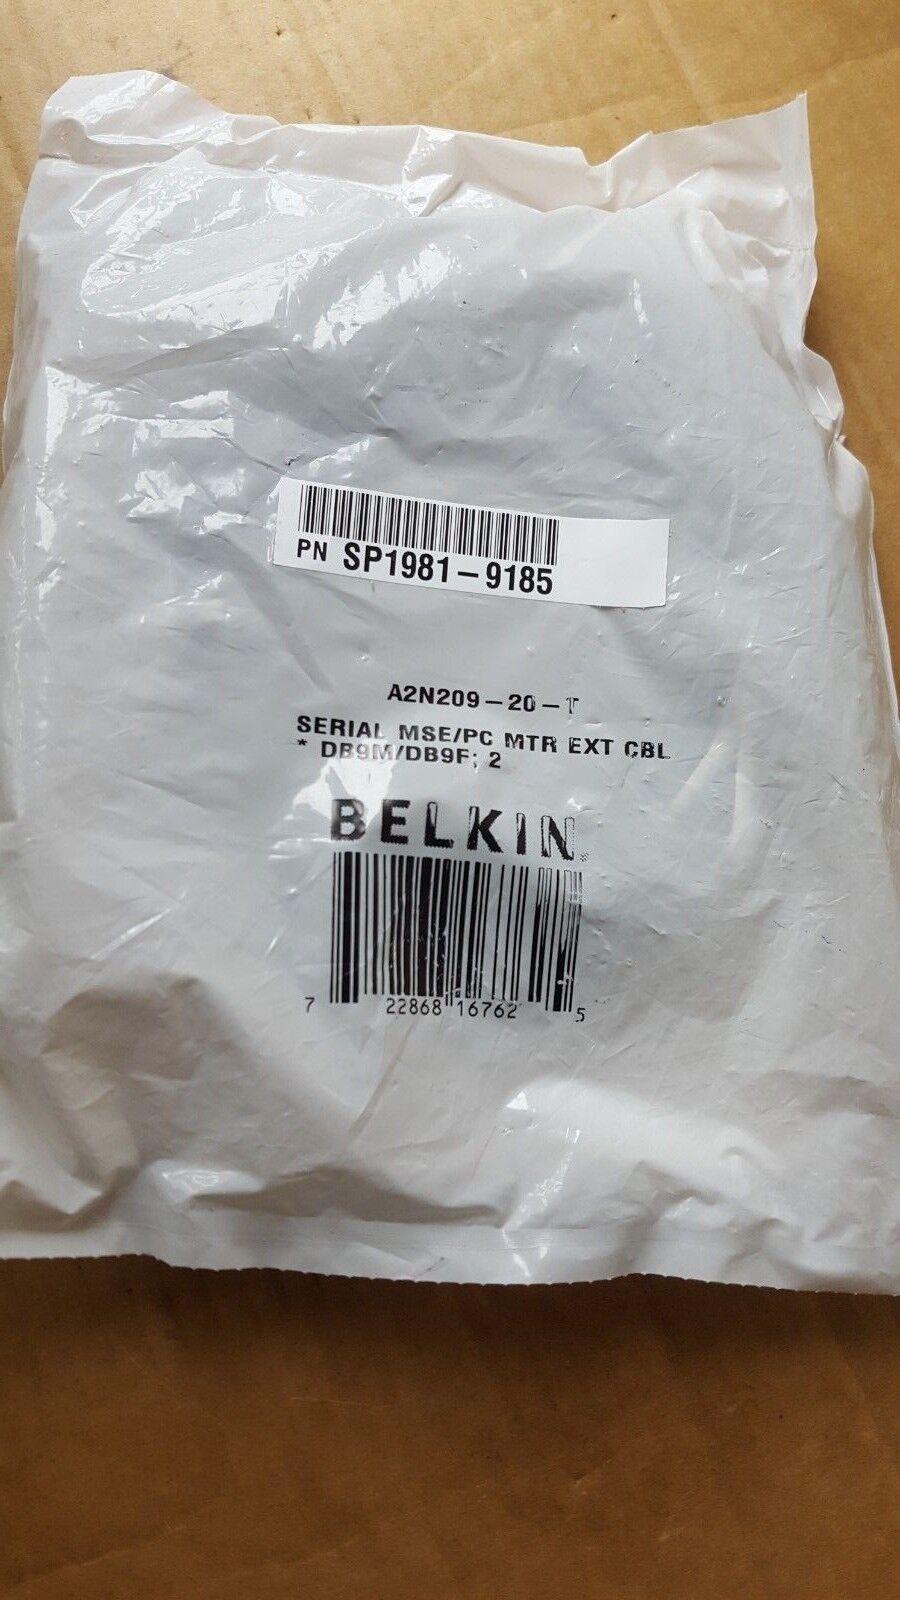 BELKIN A2N209-20-T SERIAL MSE/PC MTR EXT CBL DB9M/DB9F (BR2.3B22)